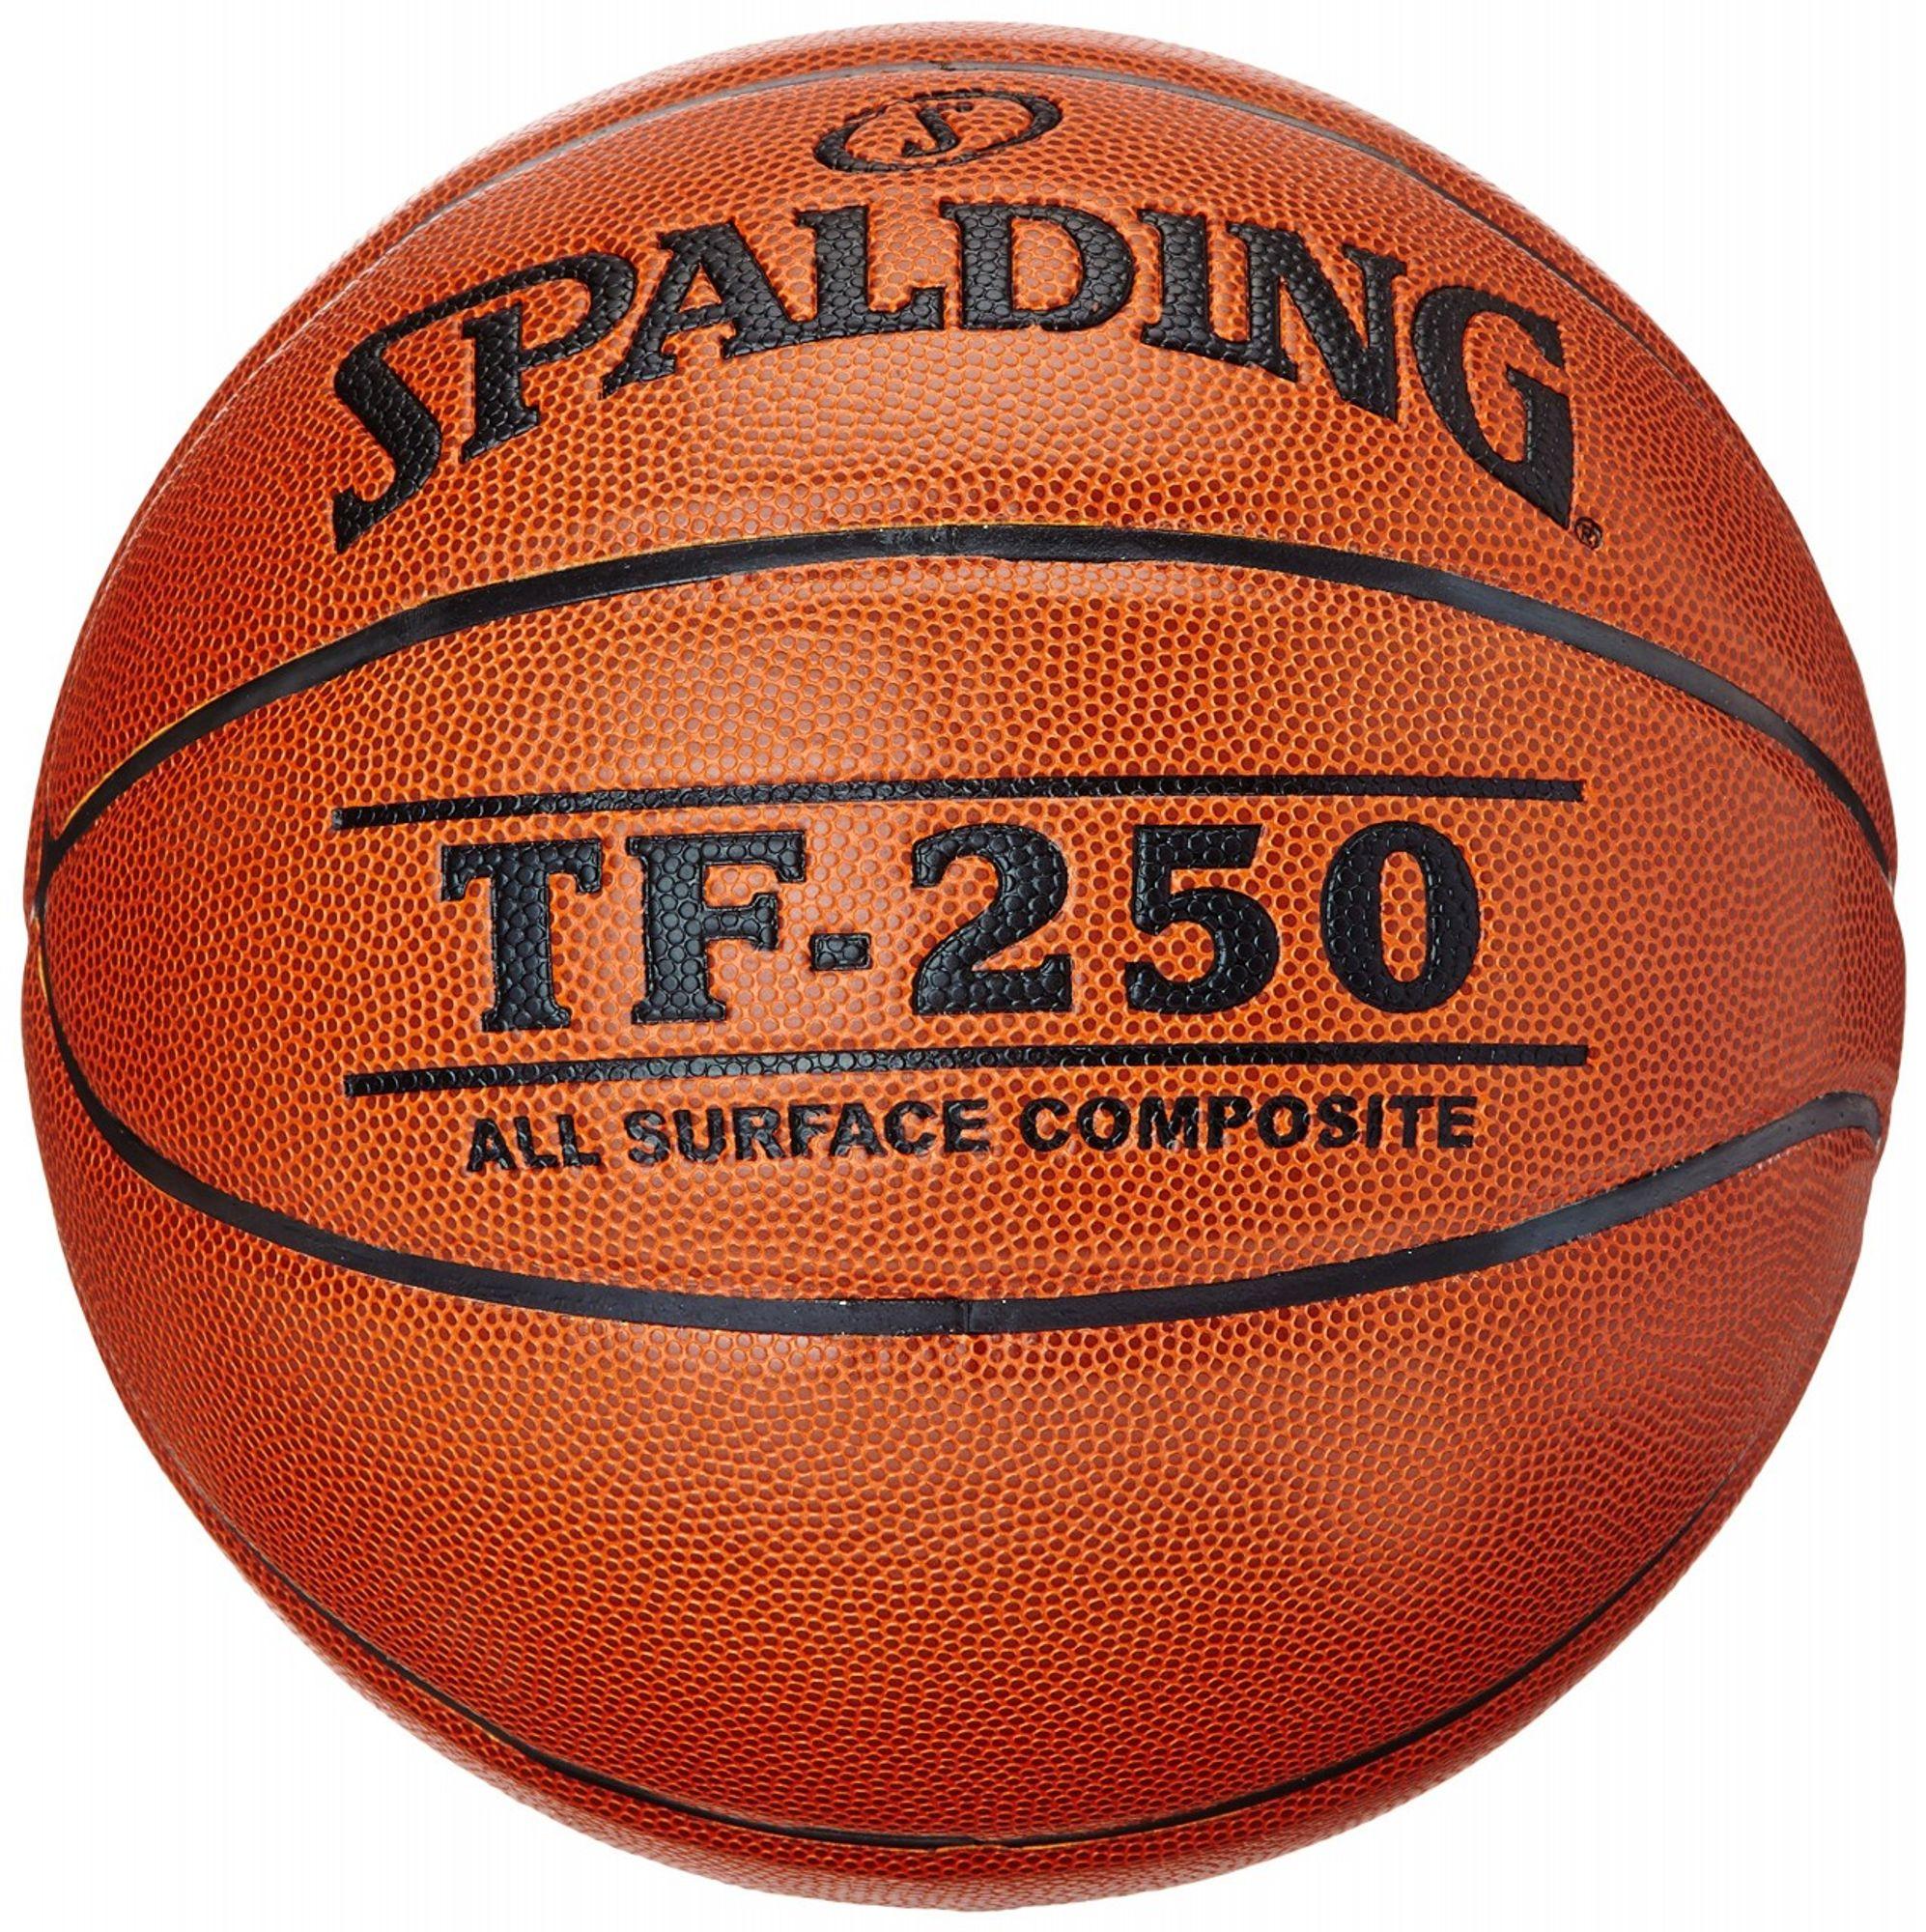 Spalding Basketball Spalding TF250 in/out sz.5, (74-537Z)